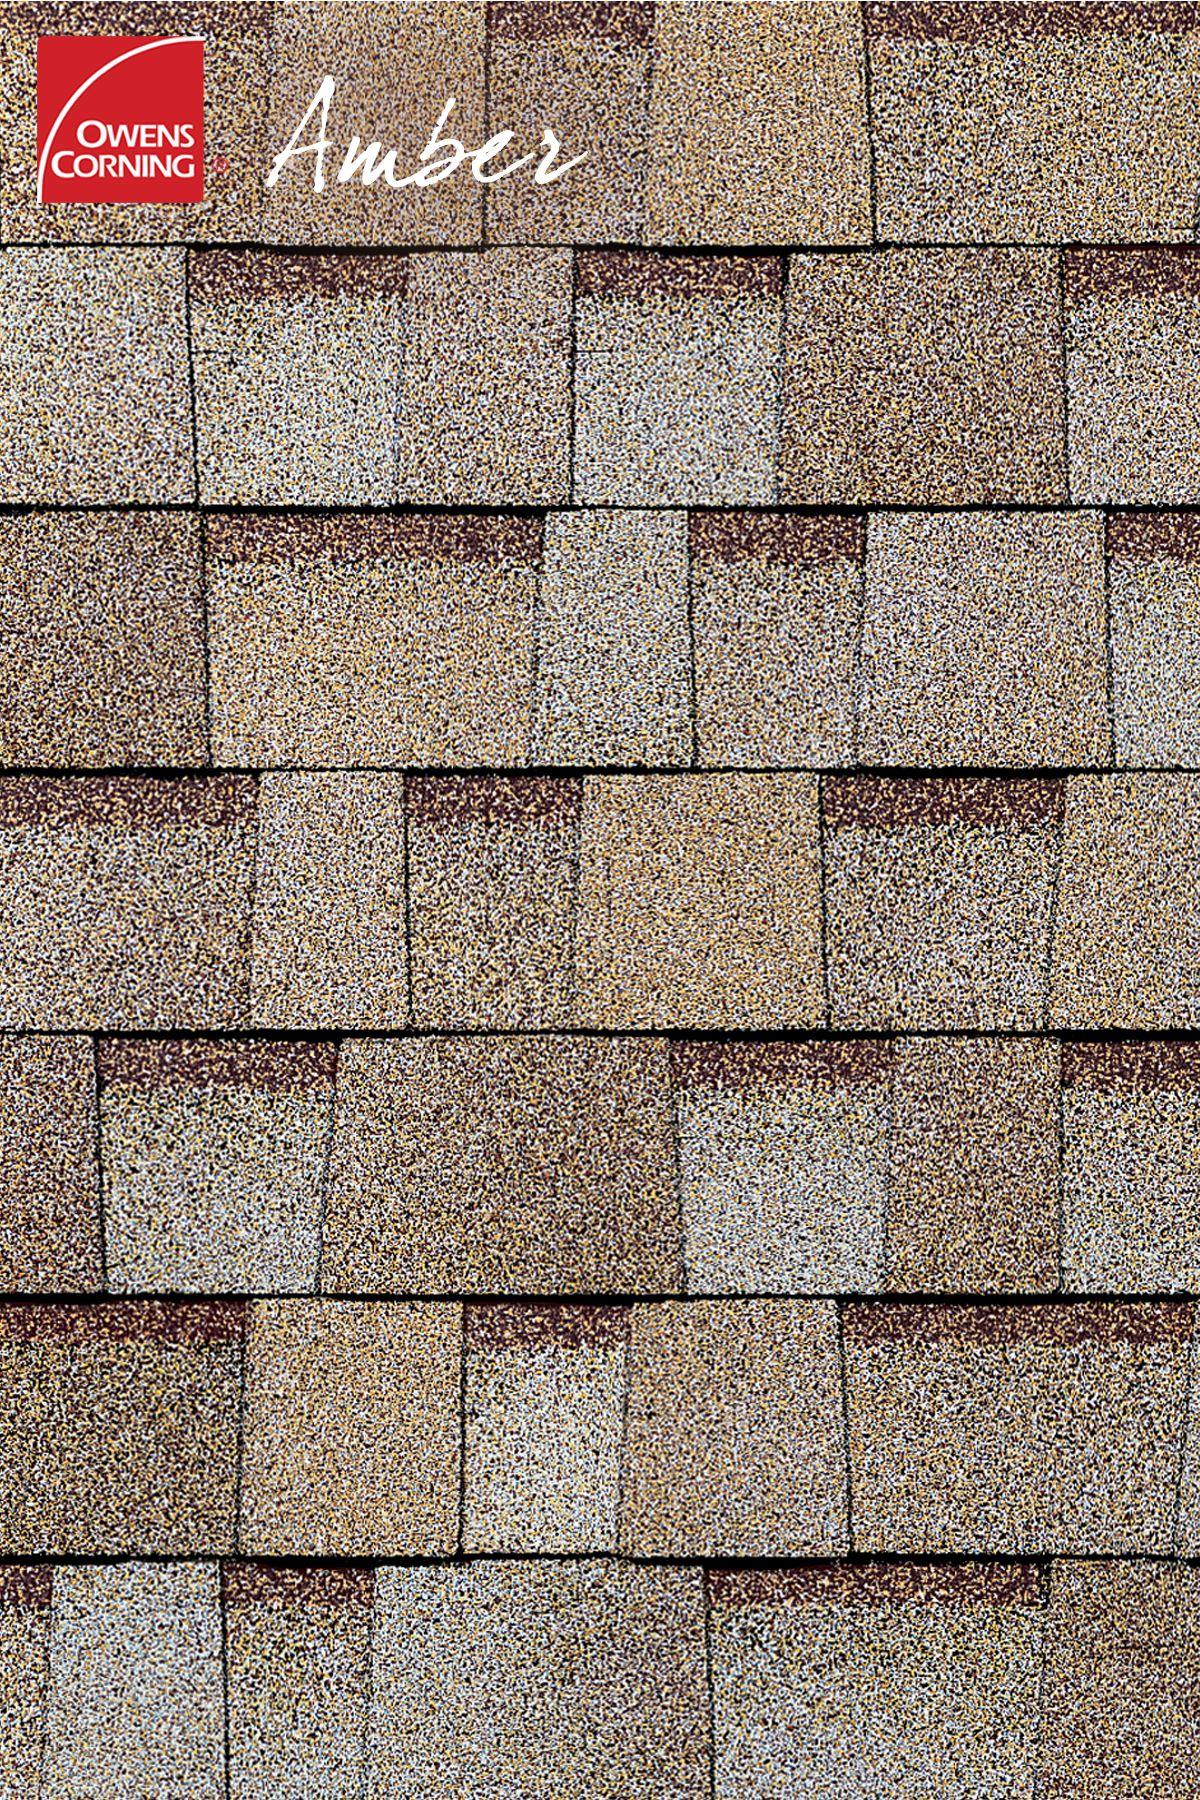 Amber Trudefinition Duration Shingles Shingle Colors Roof Colors Roof Shingles